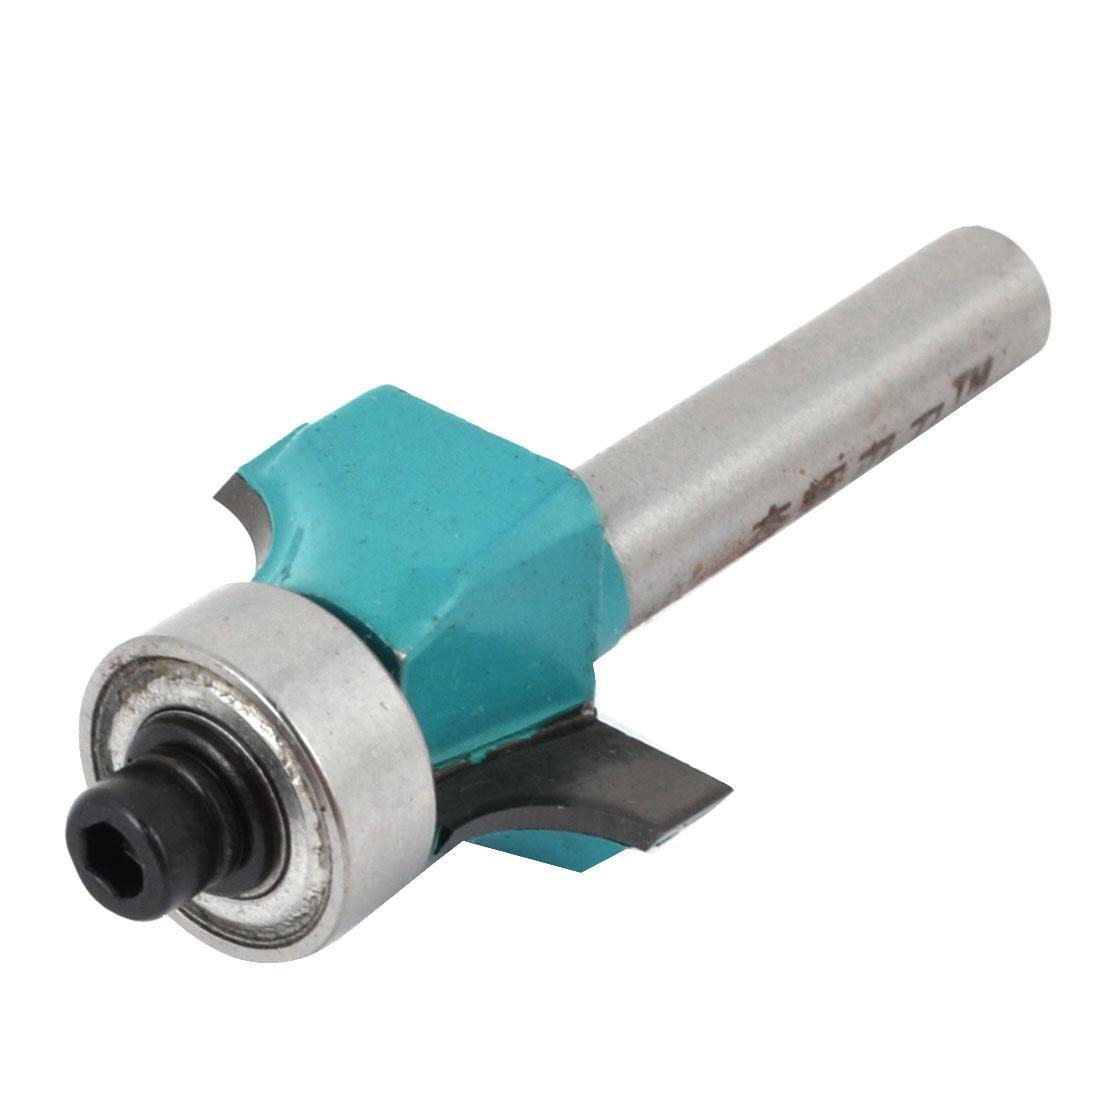 "1/4"" Shank 3/8"" Radius Two Flutes Metal Roundover Router Bit Bearing Cutter"